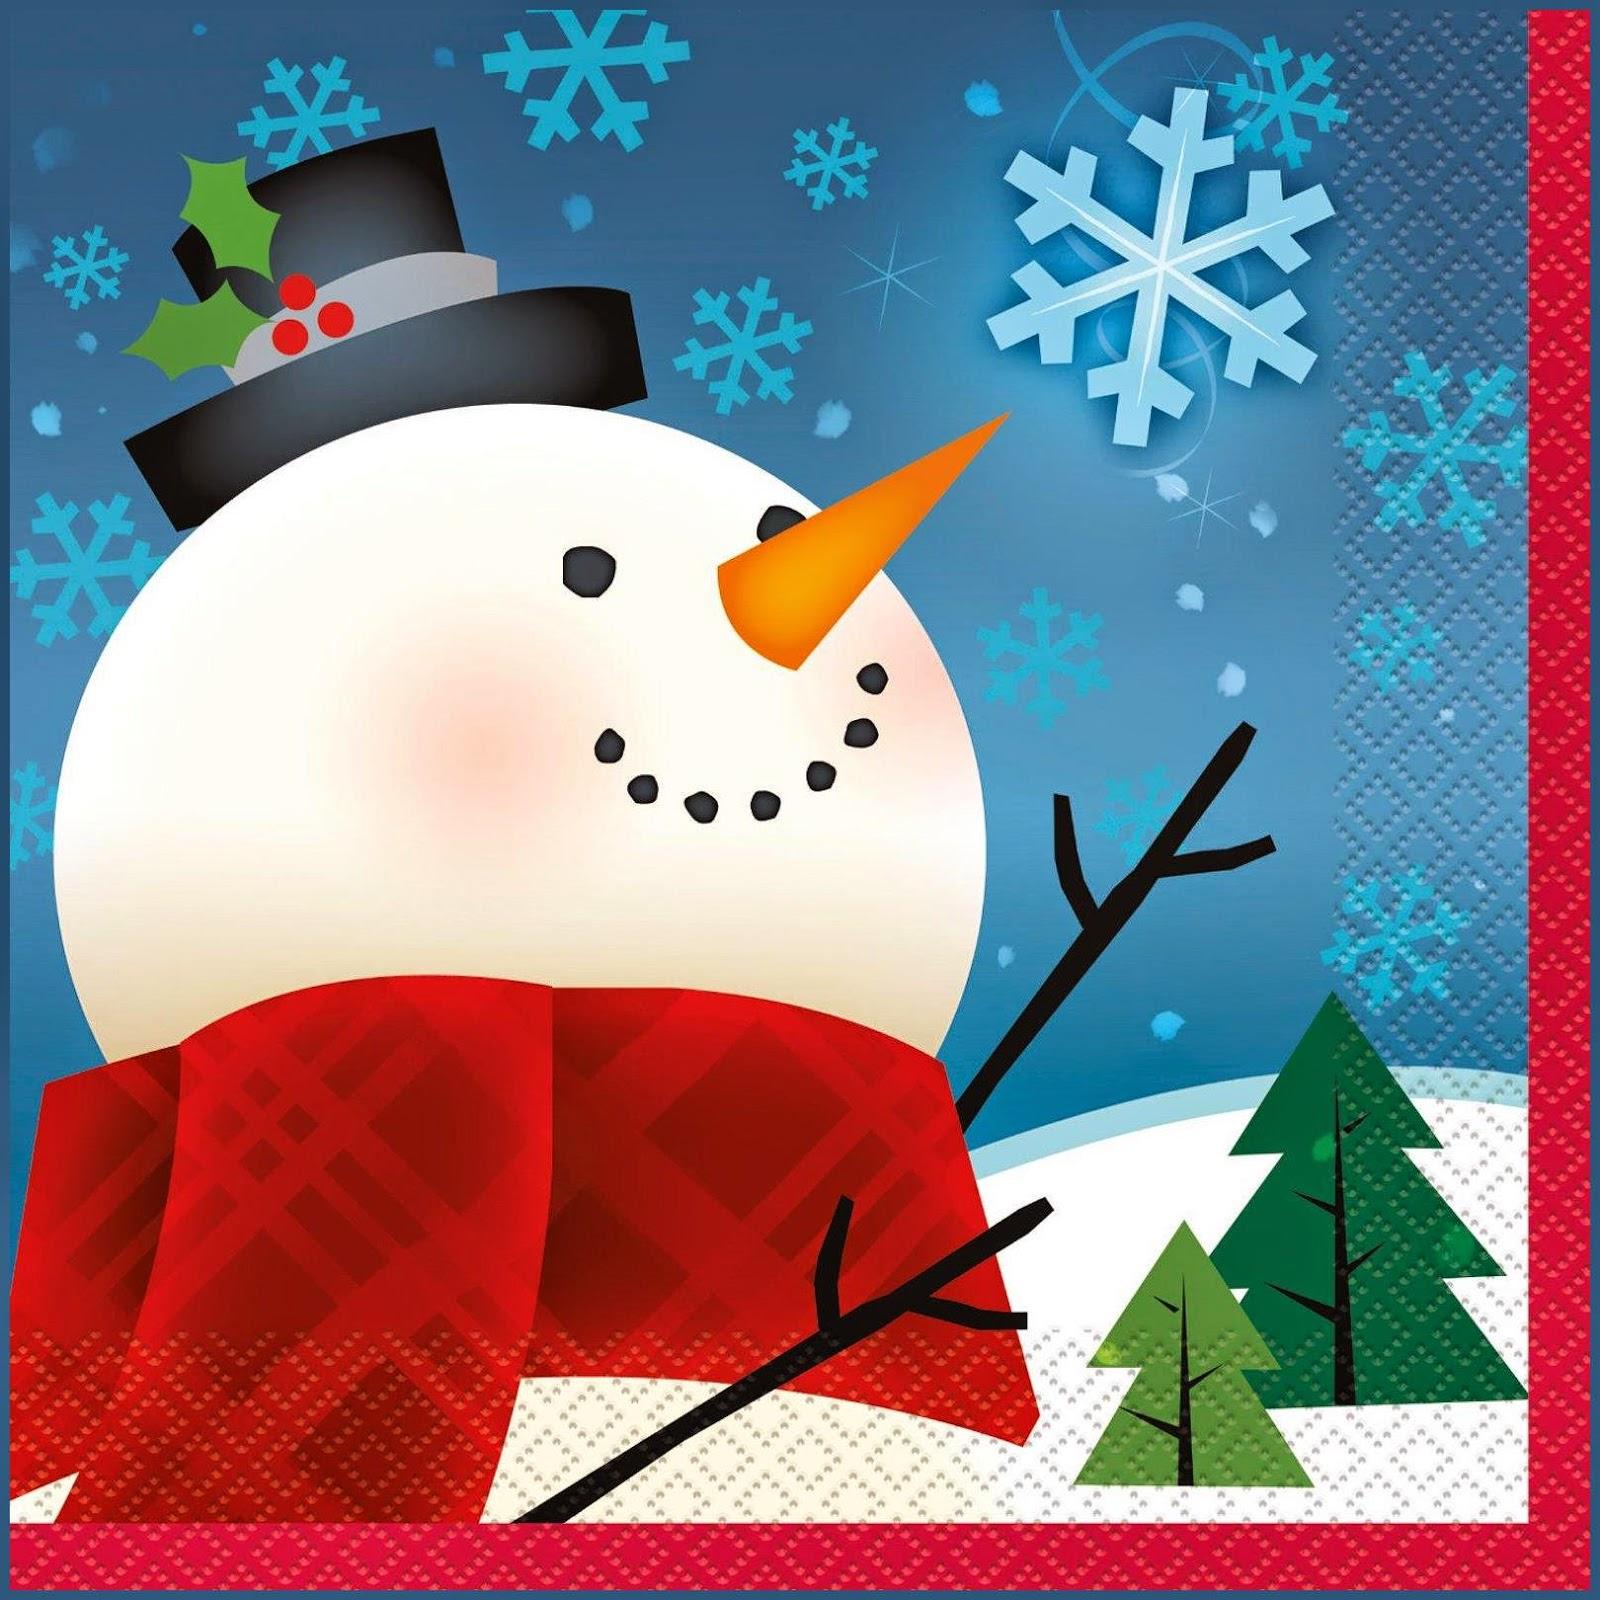 JoyFul-Snowman-Christmas-Theme